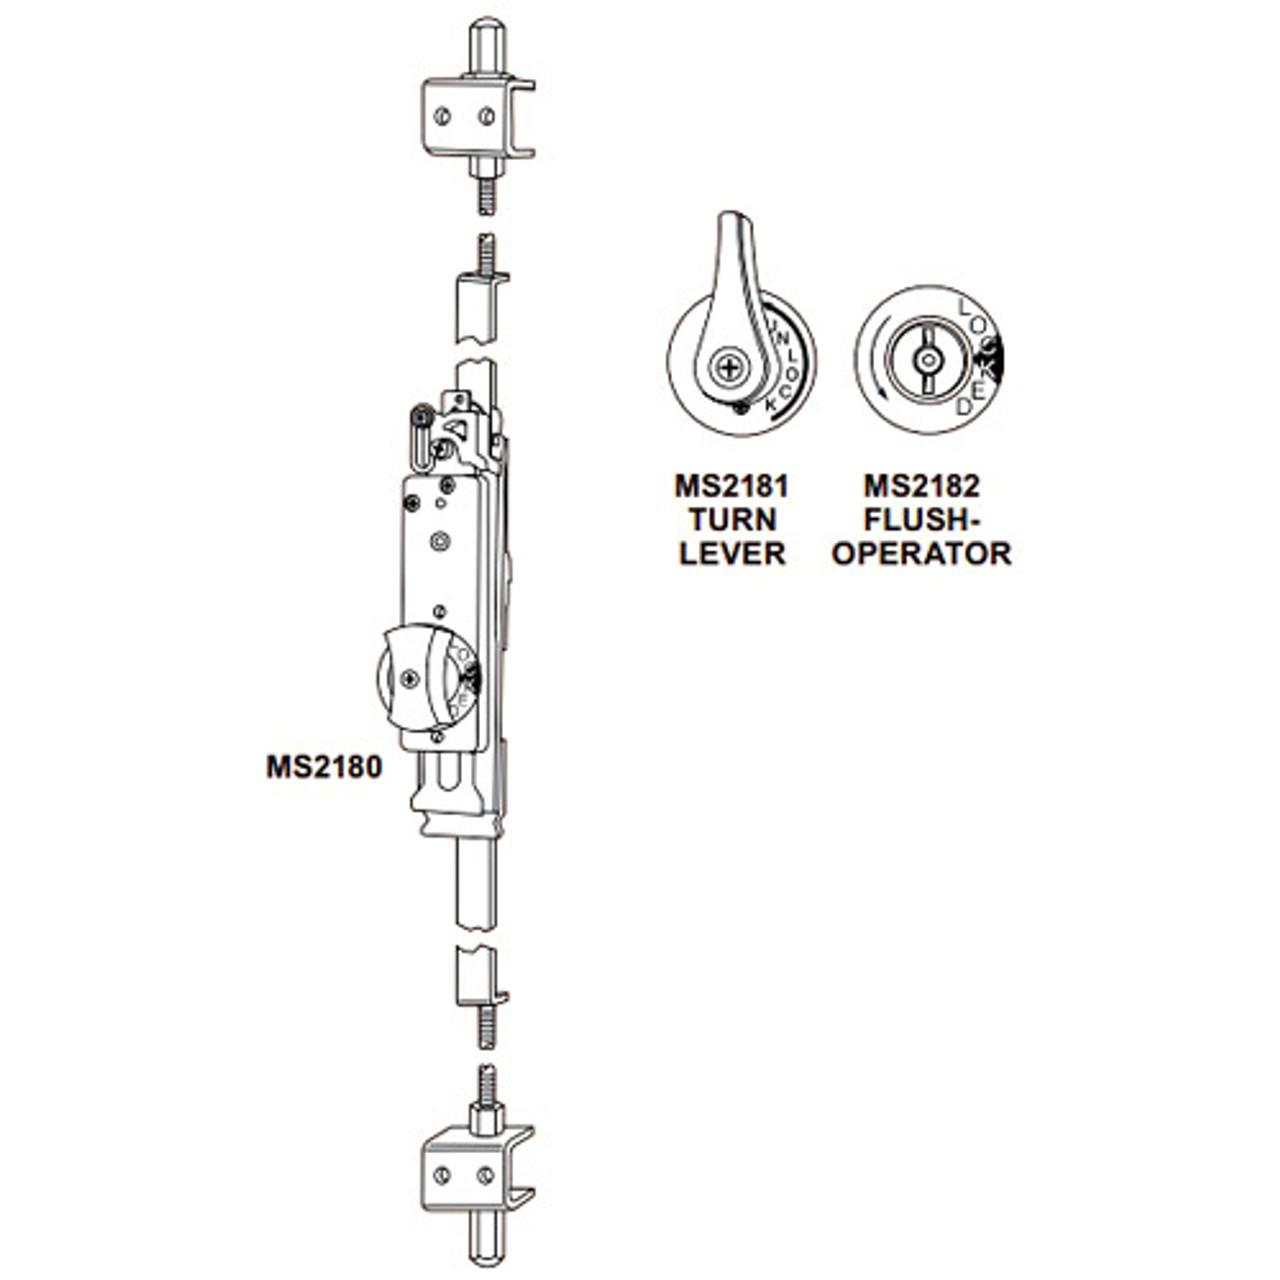 MS2182-09-119 Adams Rite Flushbolt in Black Finish